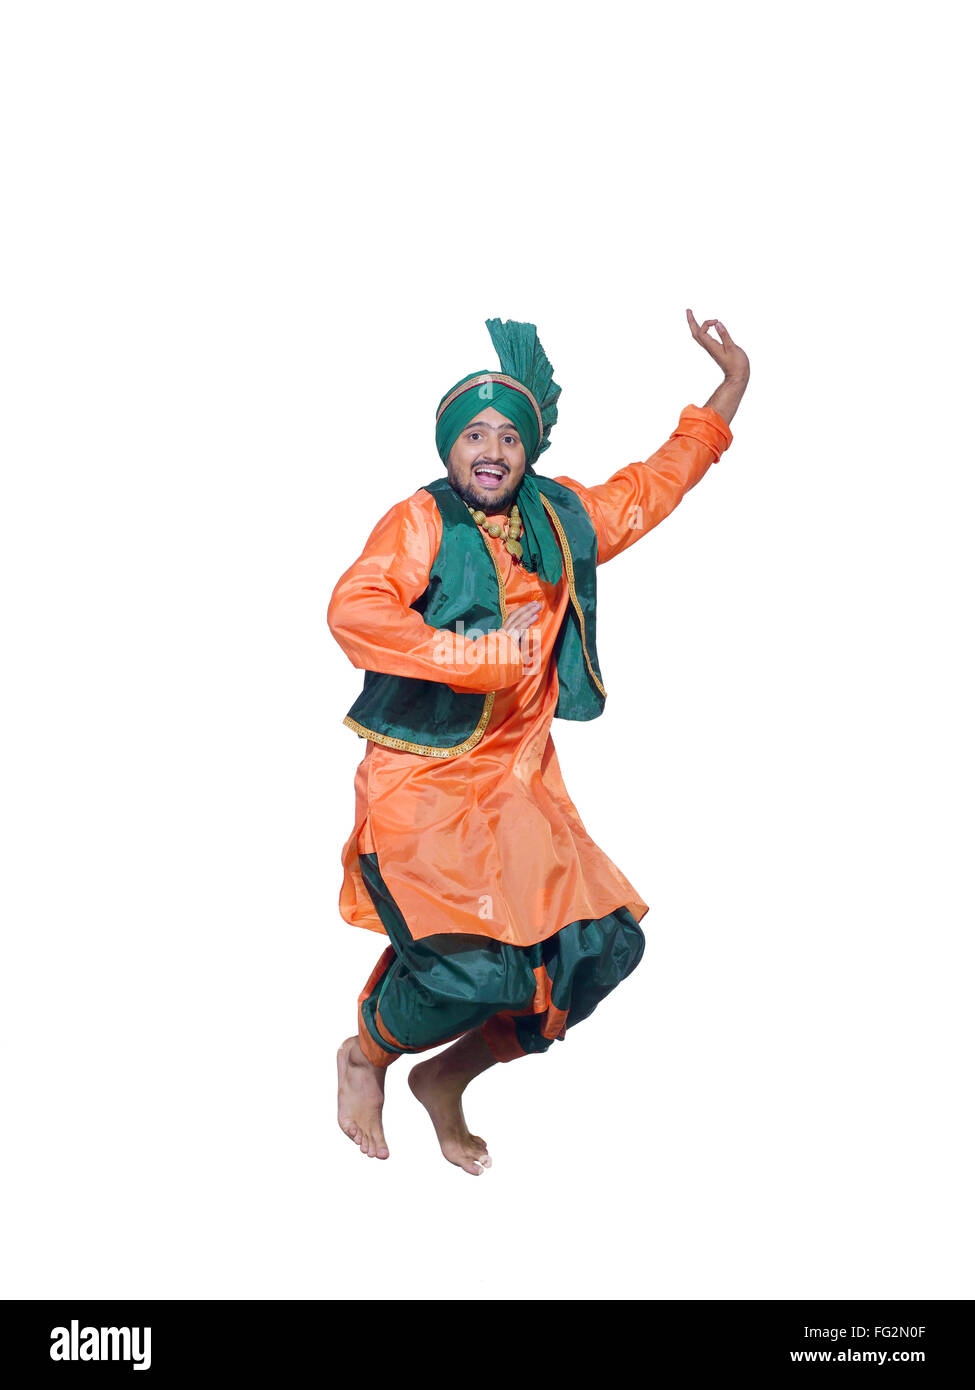 Dancer performing folk dance bhangra MR#779F - Stock Image